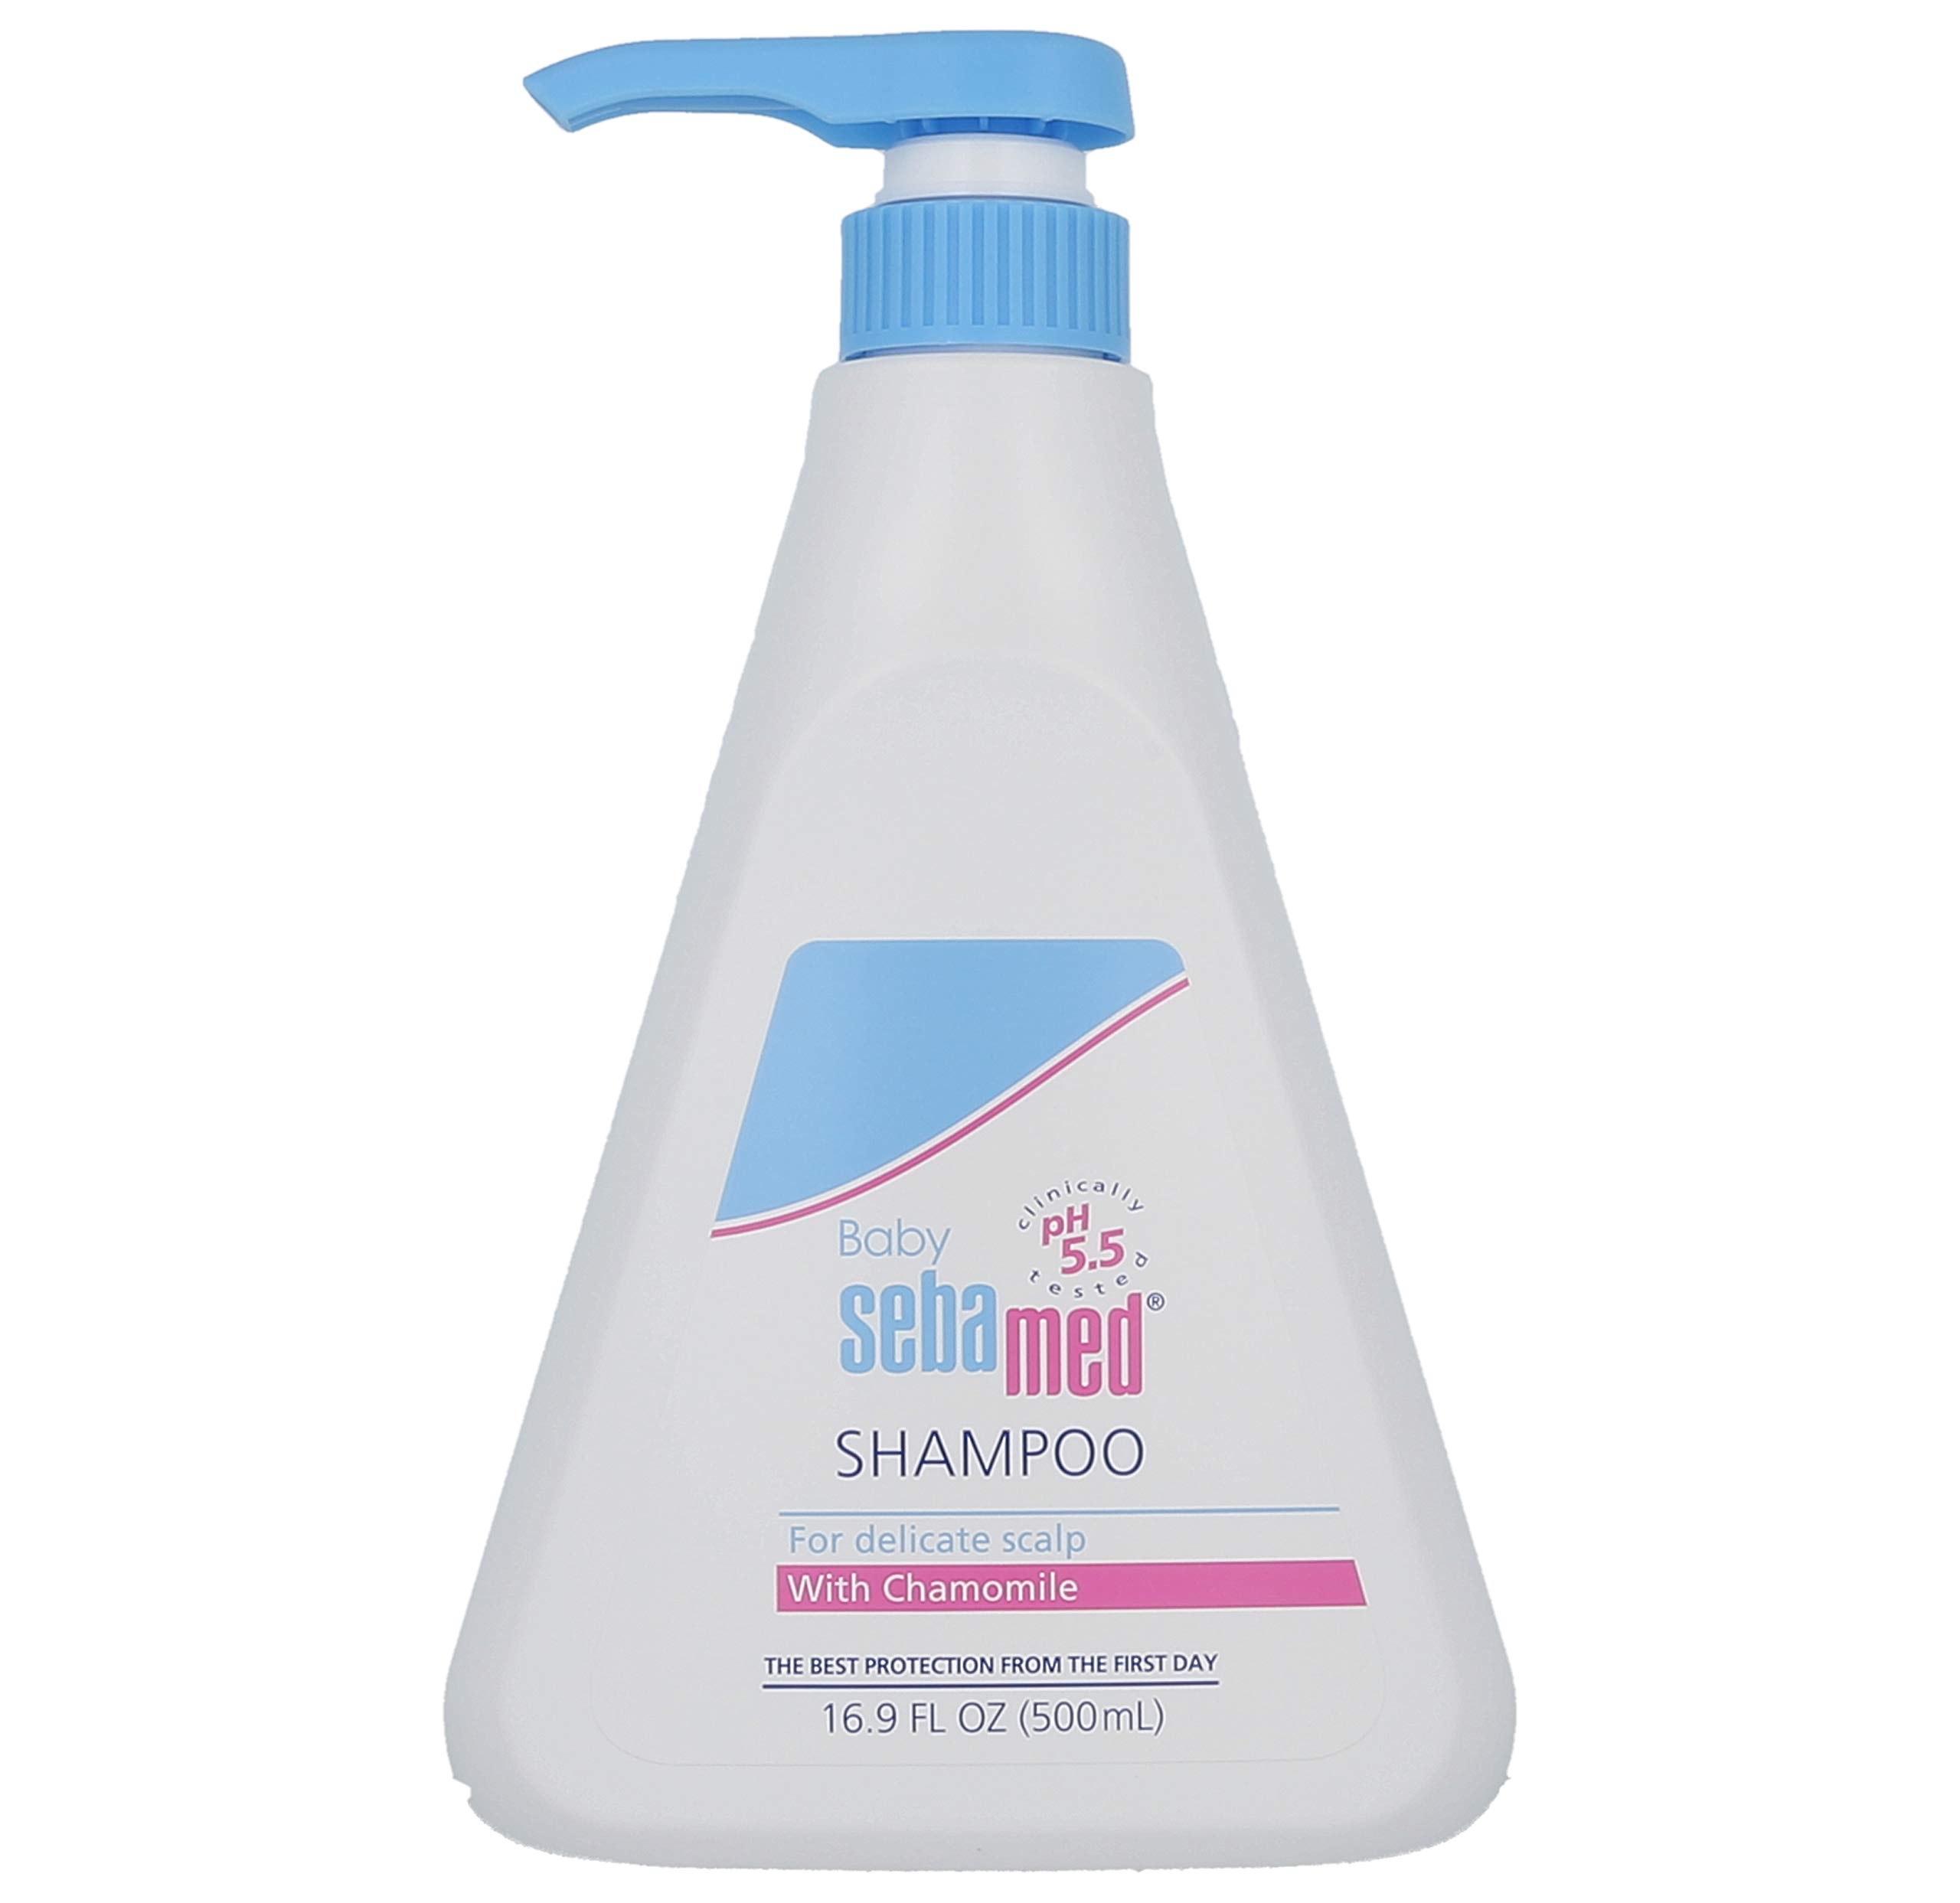 Sebamed Children's Shampoo, 500 ml, 16.9 Fluid Ounce